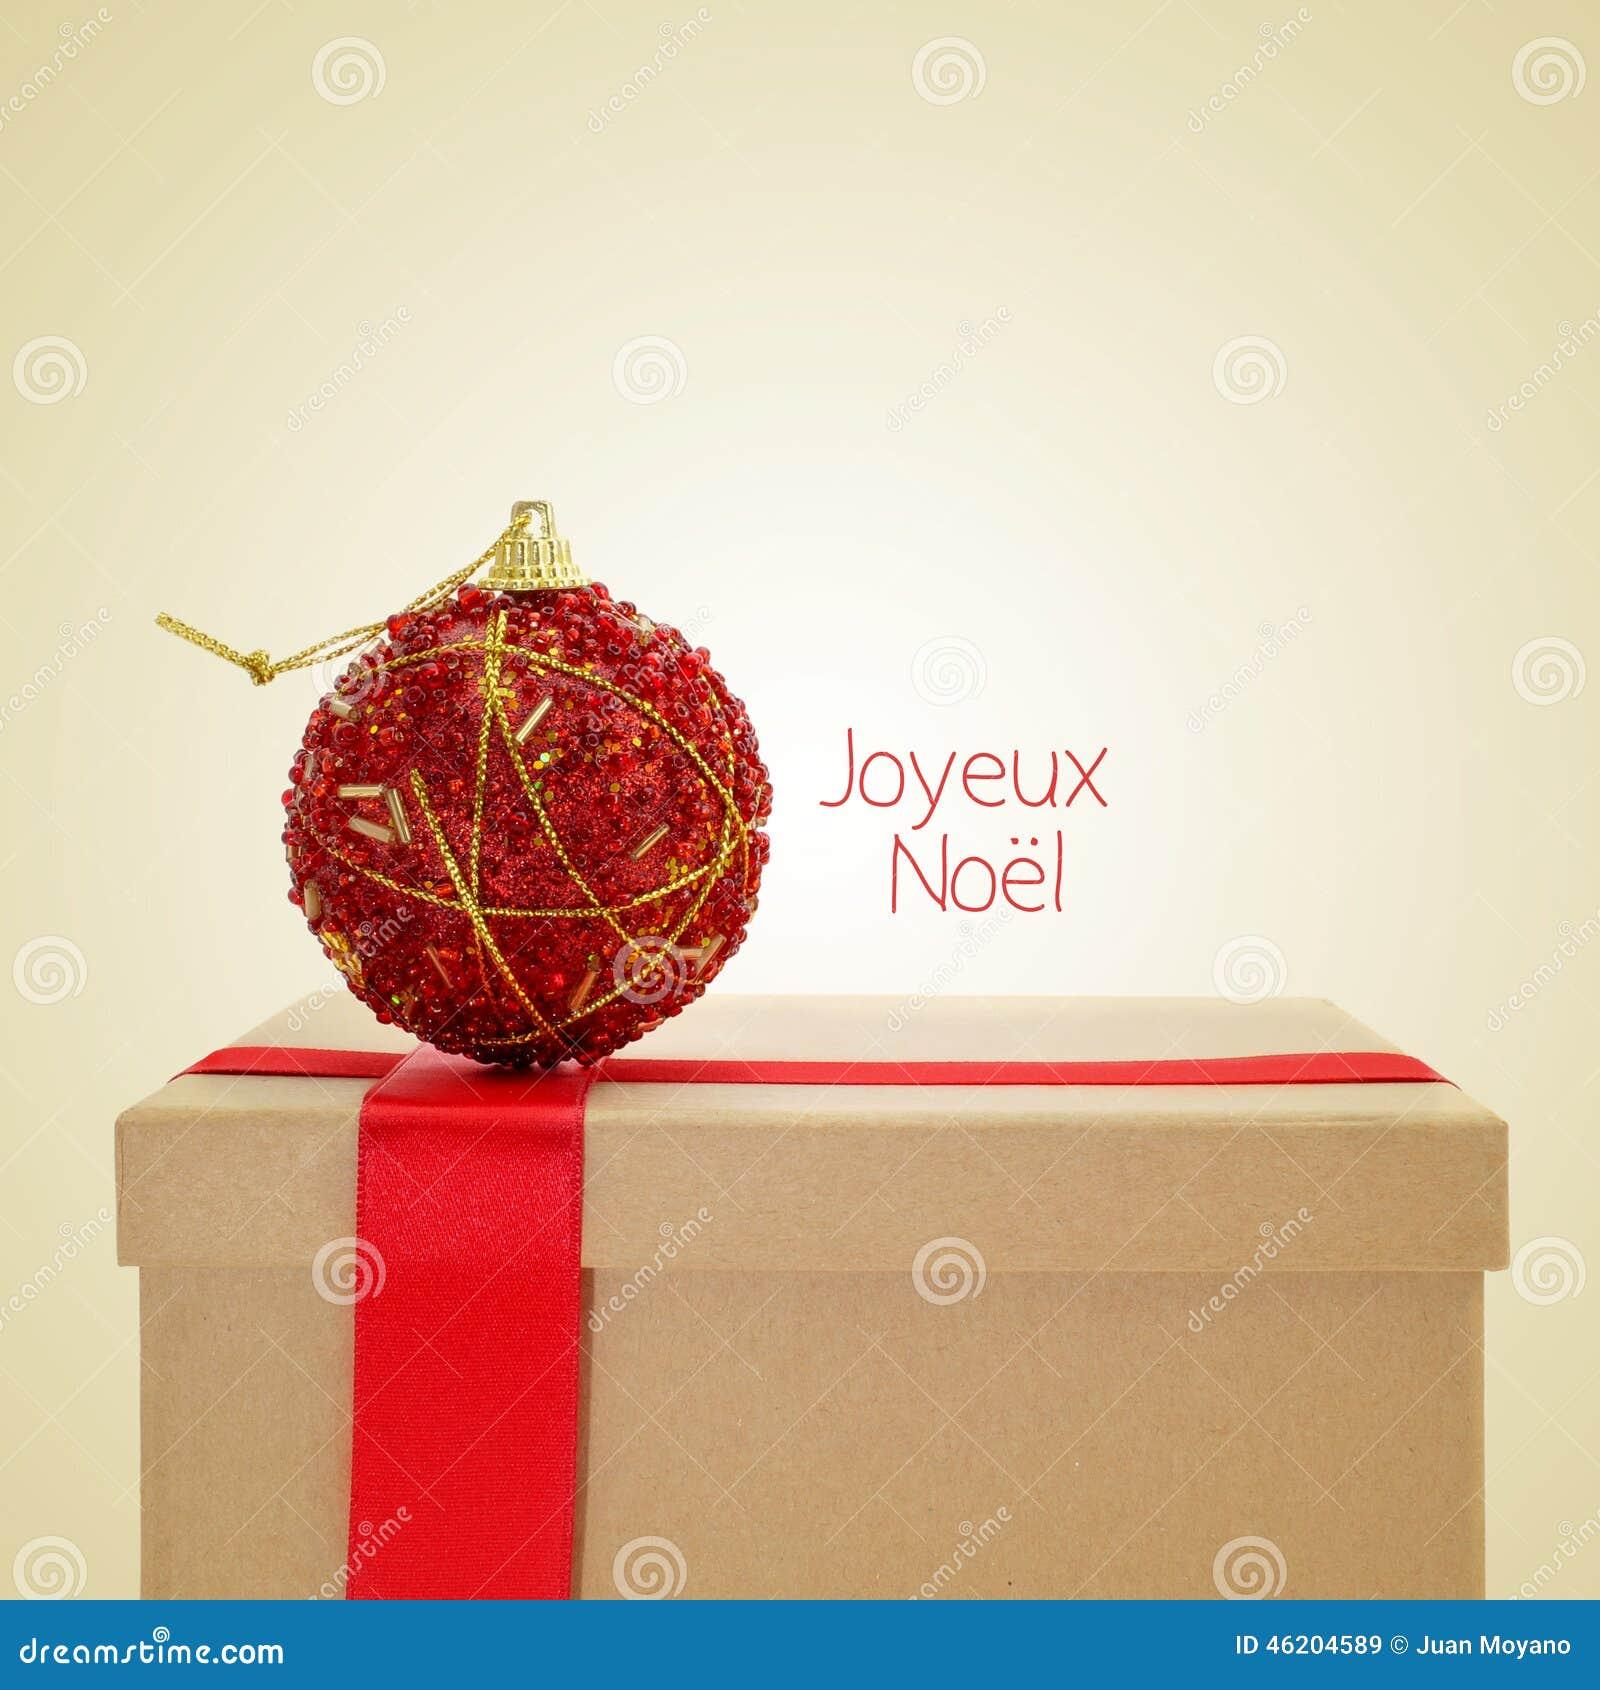 Frasi Di Natale In Francese.Noel Di Joyeux Buon Natale In Francese Con Un Retro